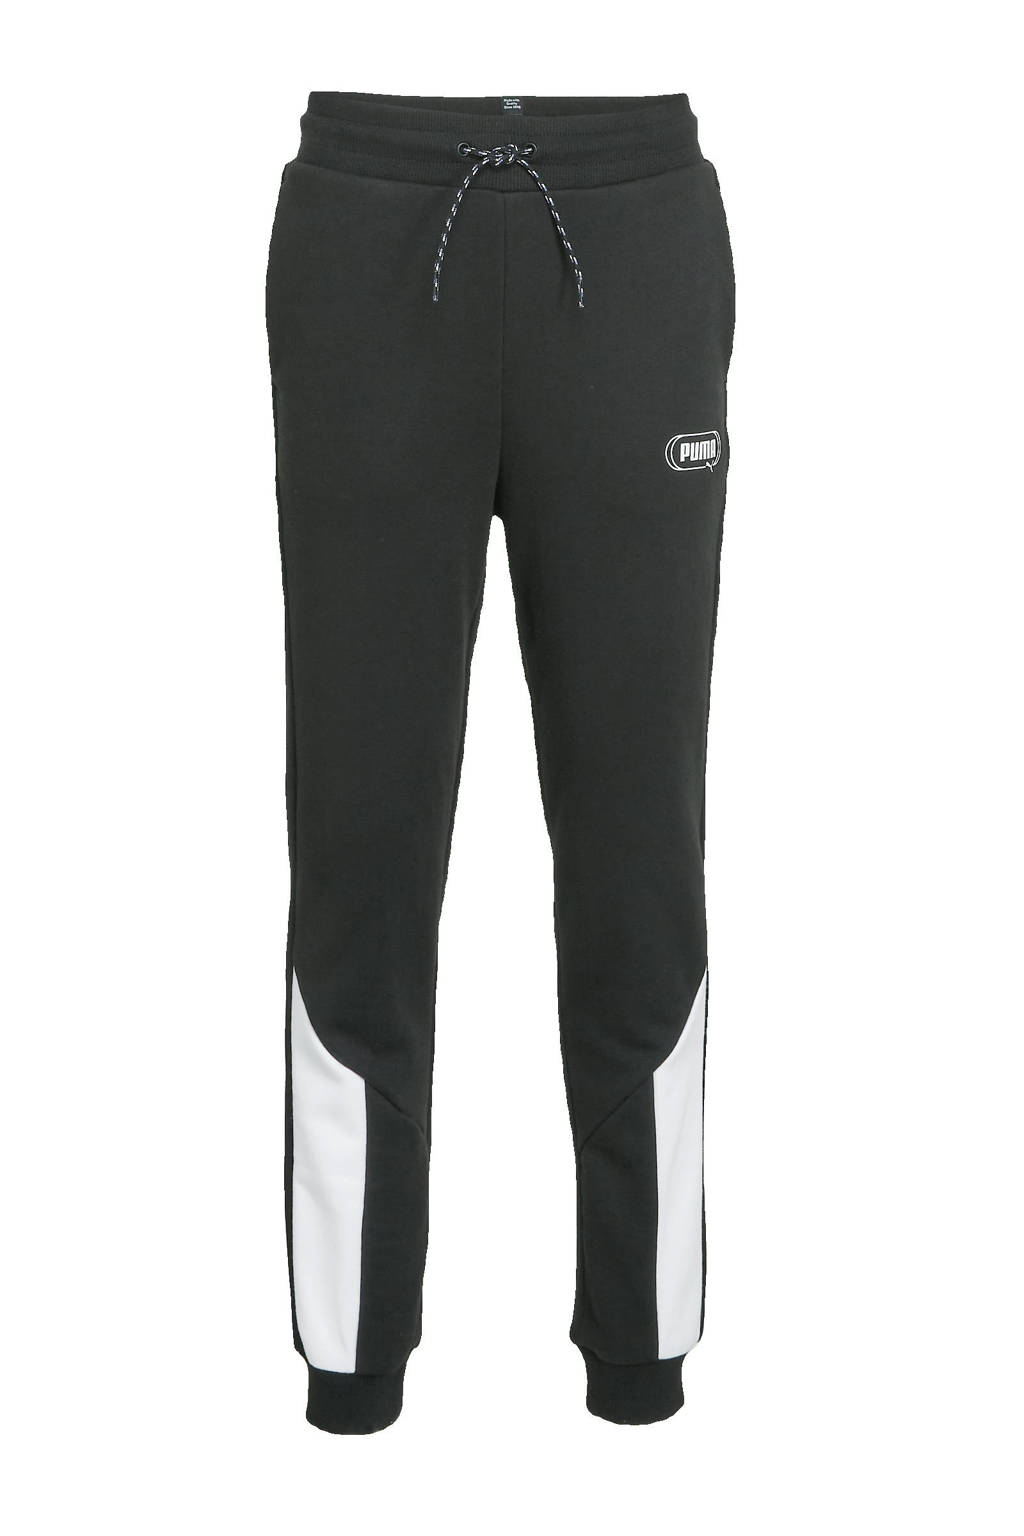 Puma joggingbroek zwart/wit, Zwart/wit